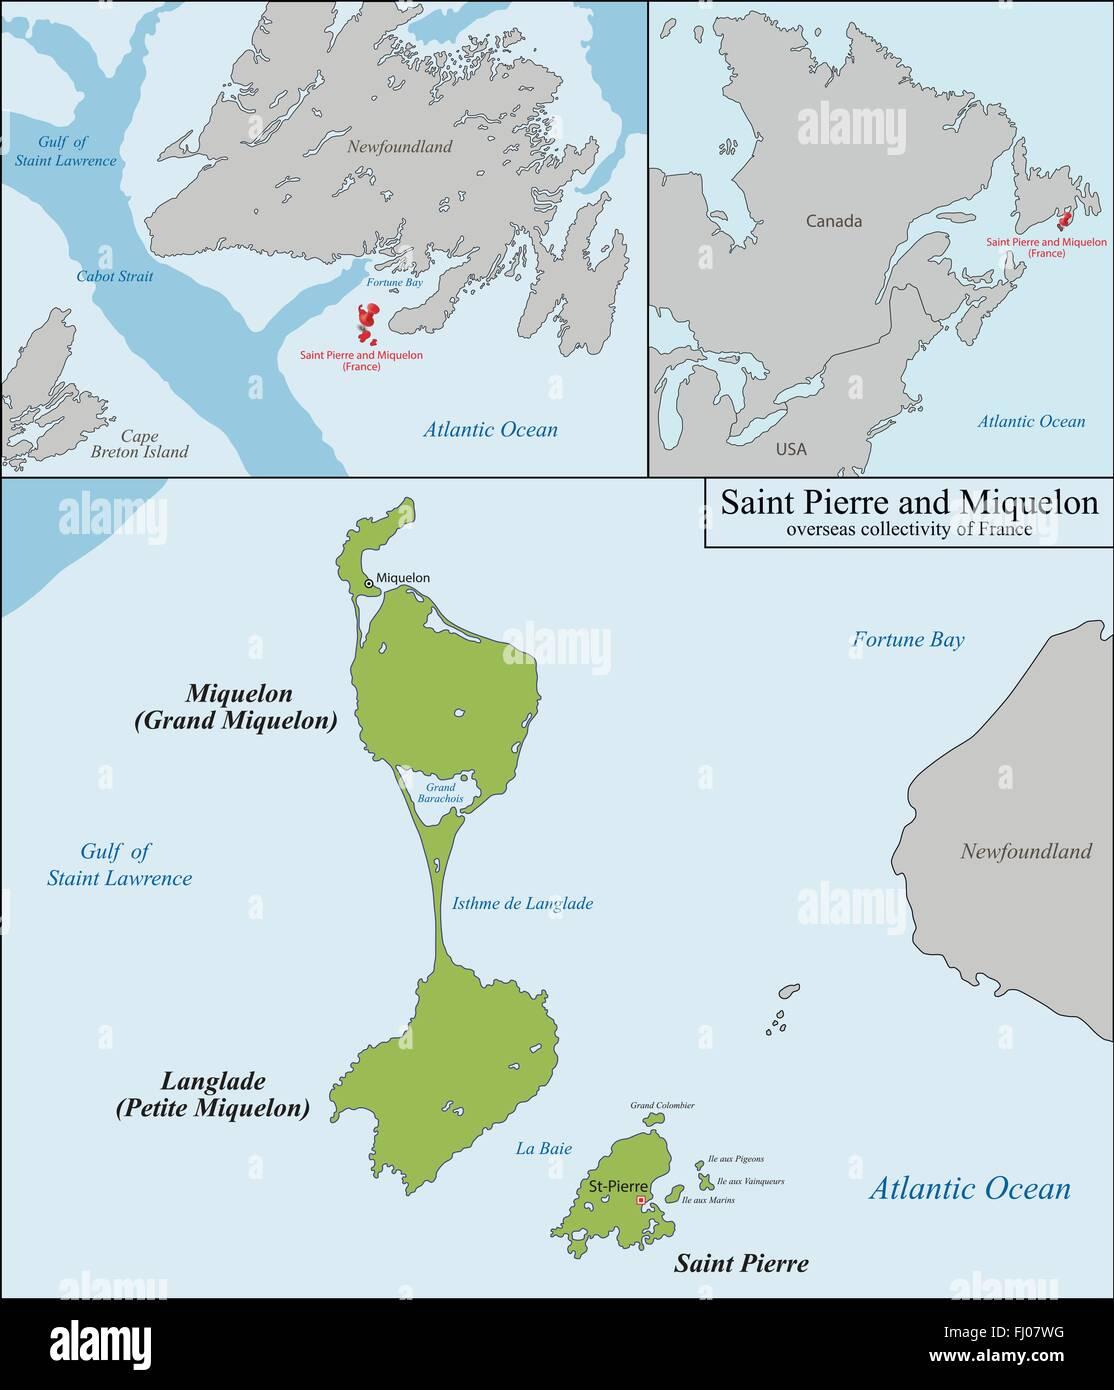 Saint Pierre And Miquelon Map Stock Vector Art Illustration - Saint pierre and miquelon map